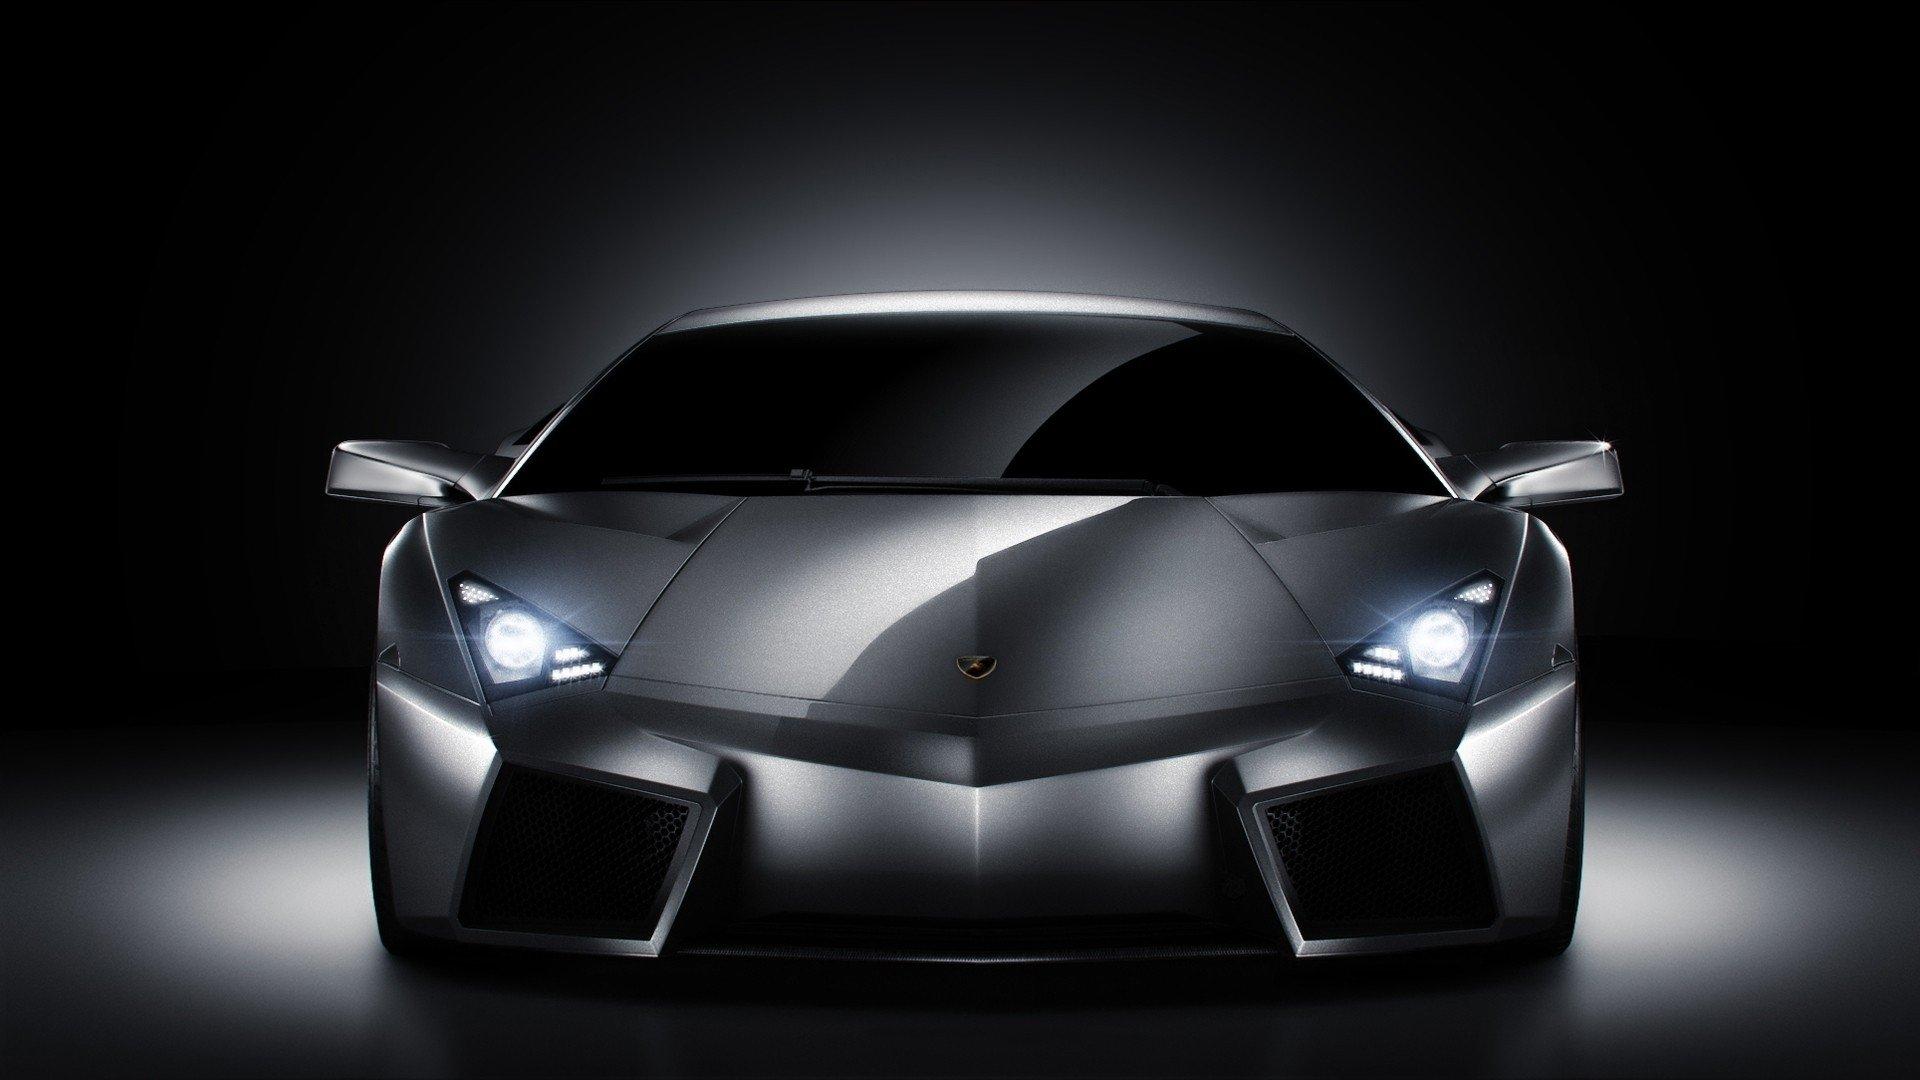 Lamborghini Reventon HD Wallpaper